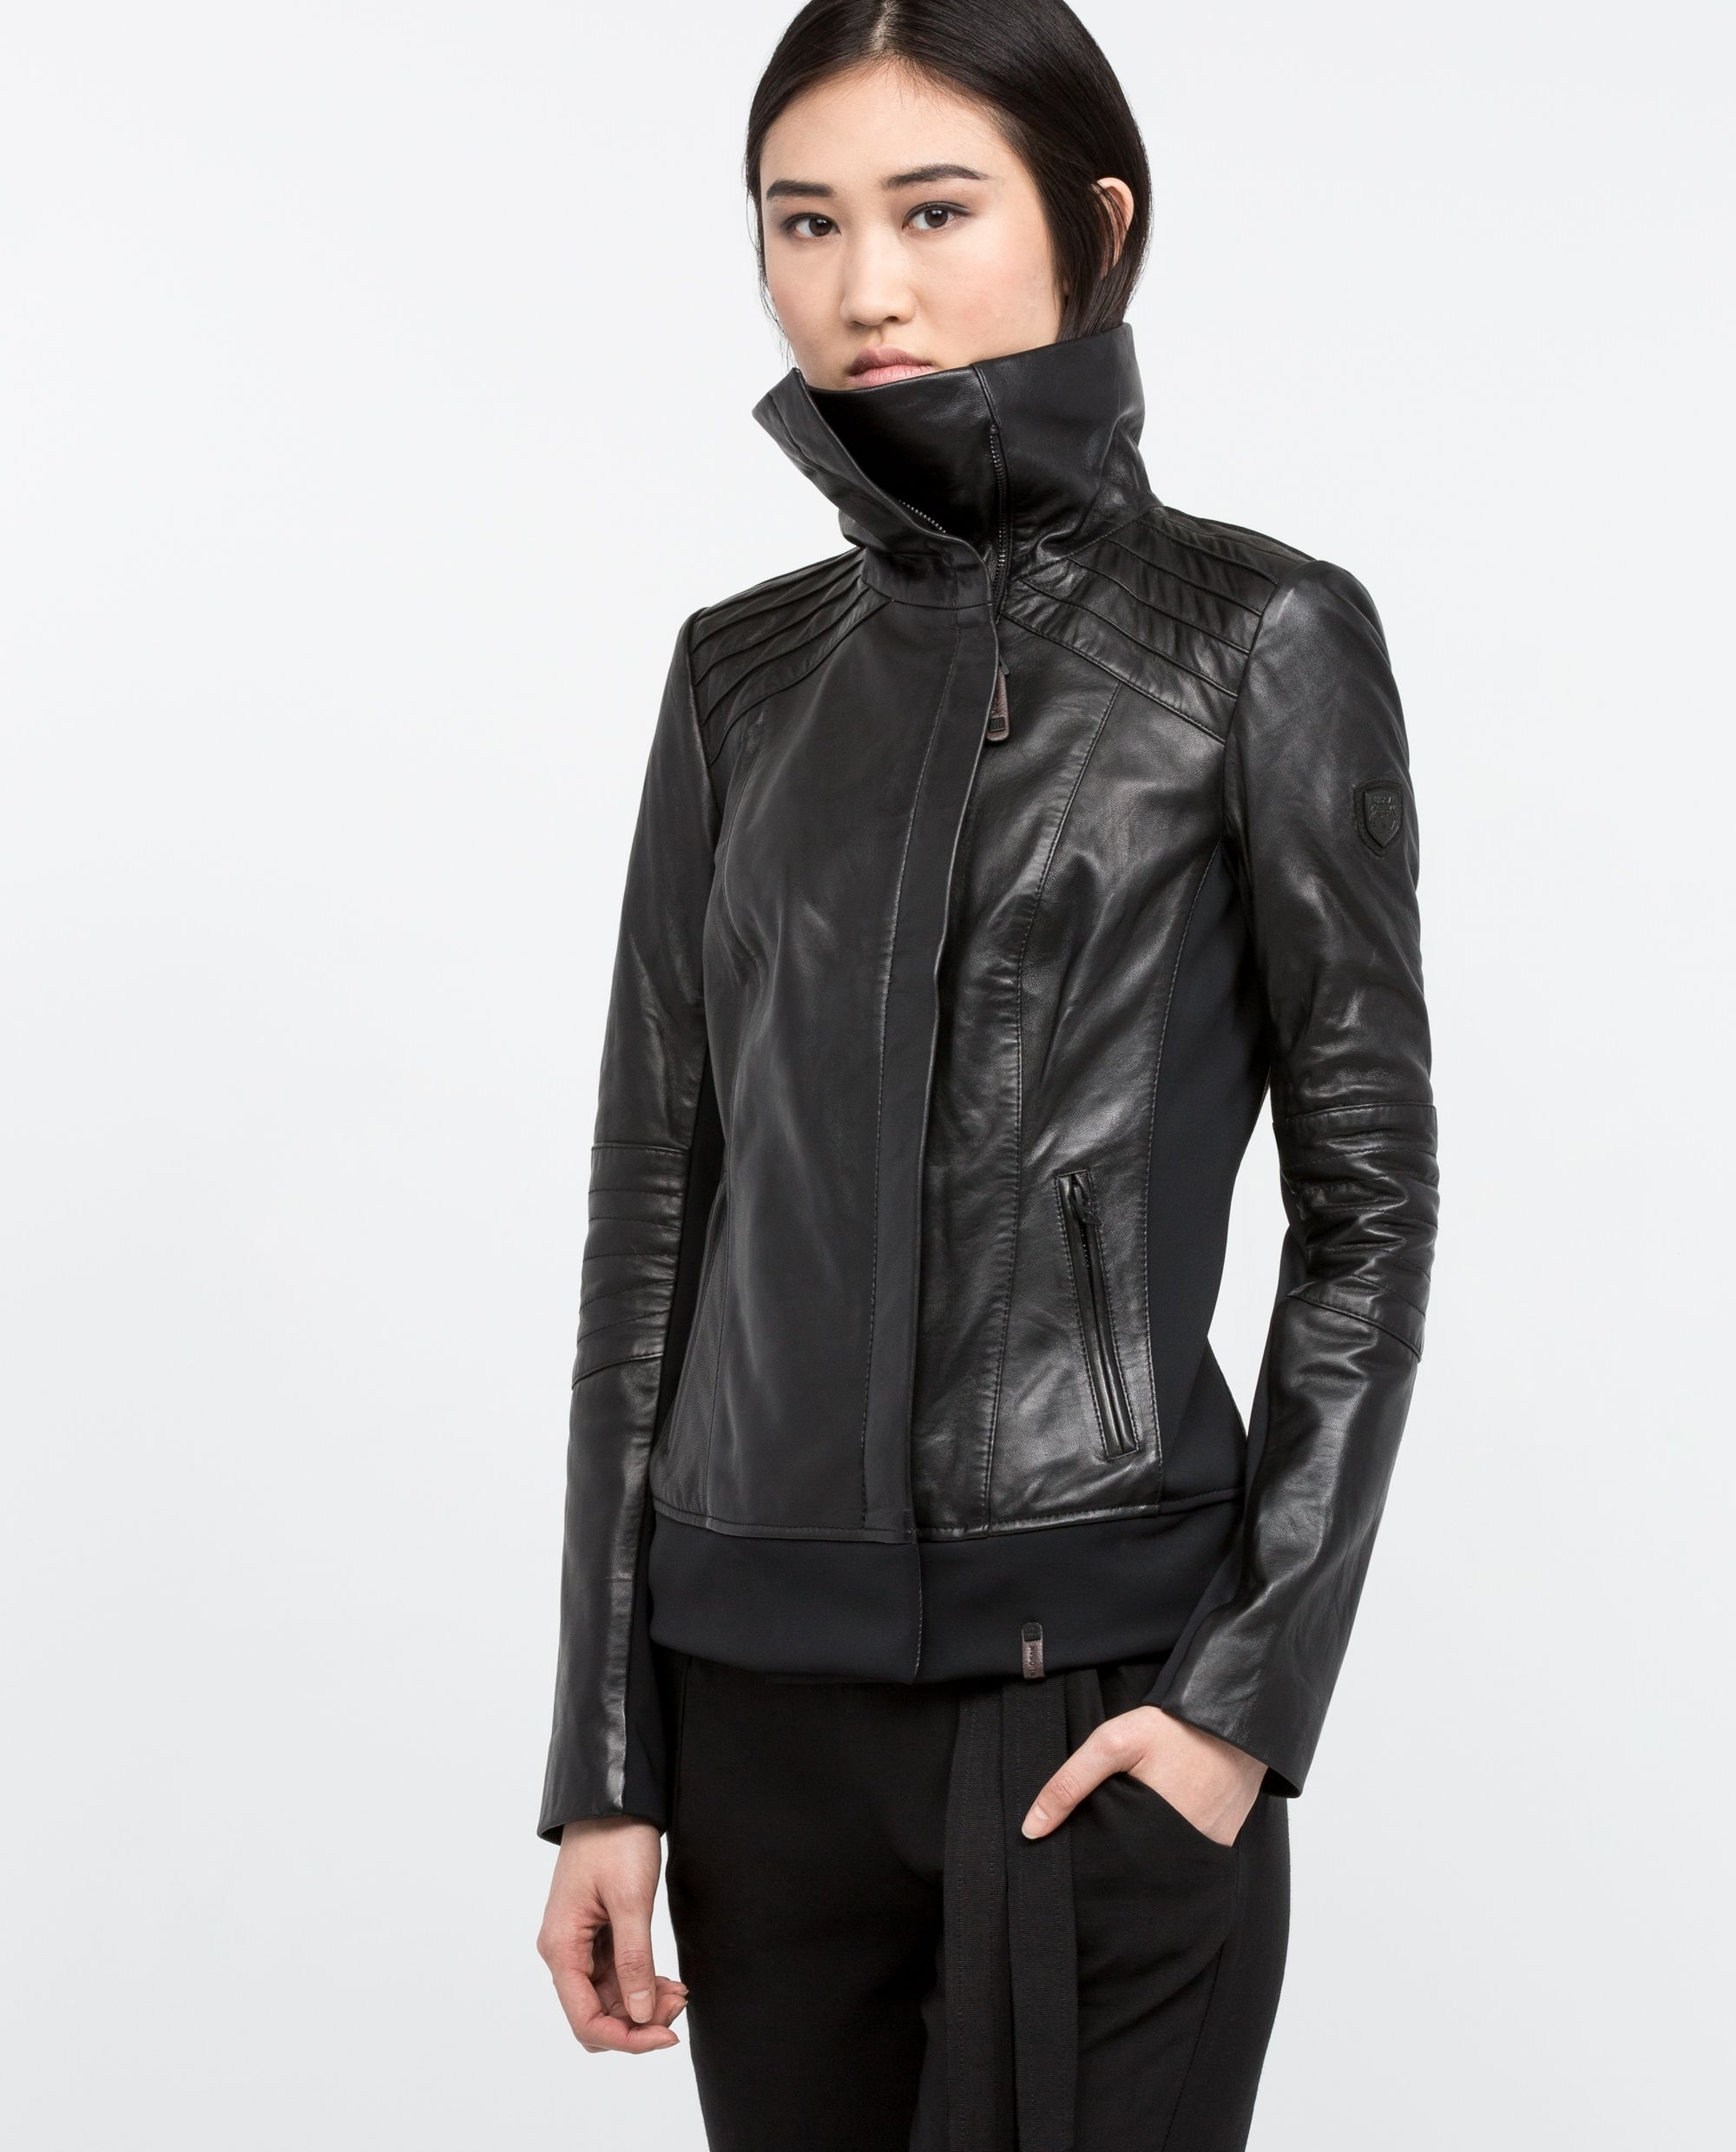 ab4795de06 Presley | Outerwear trends | Jackets, Men's coats, jackets, Cool jackets